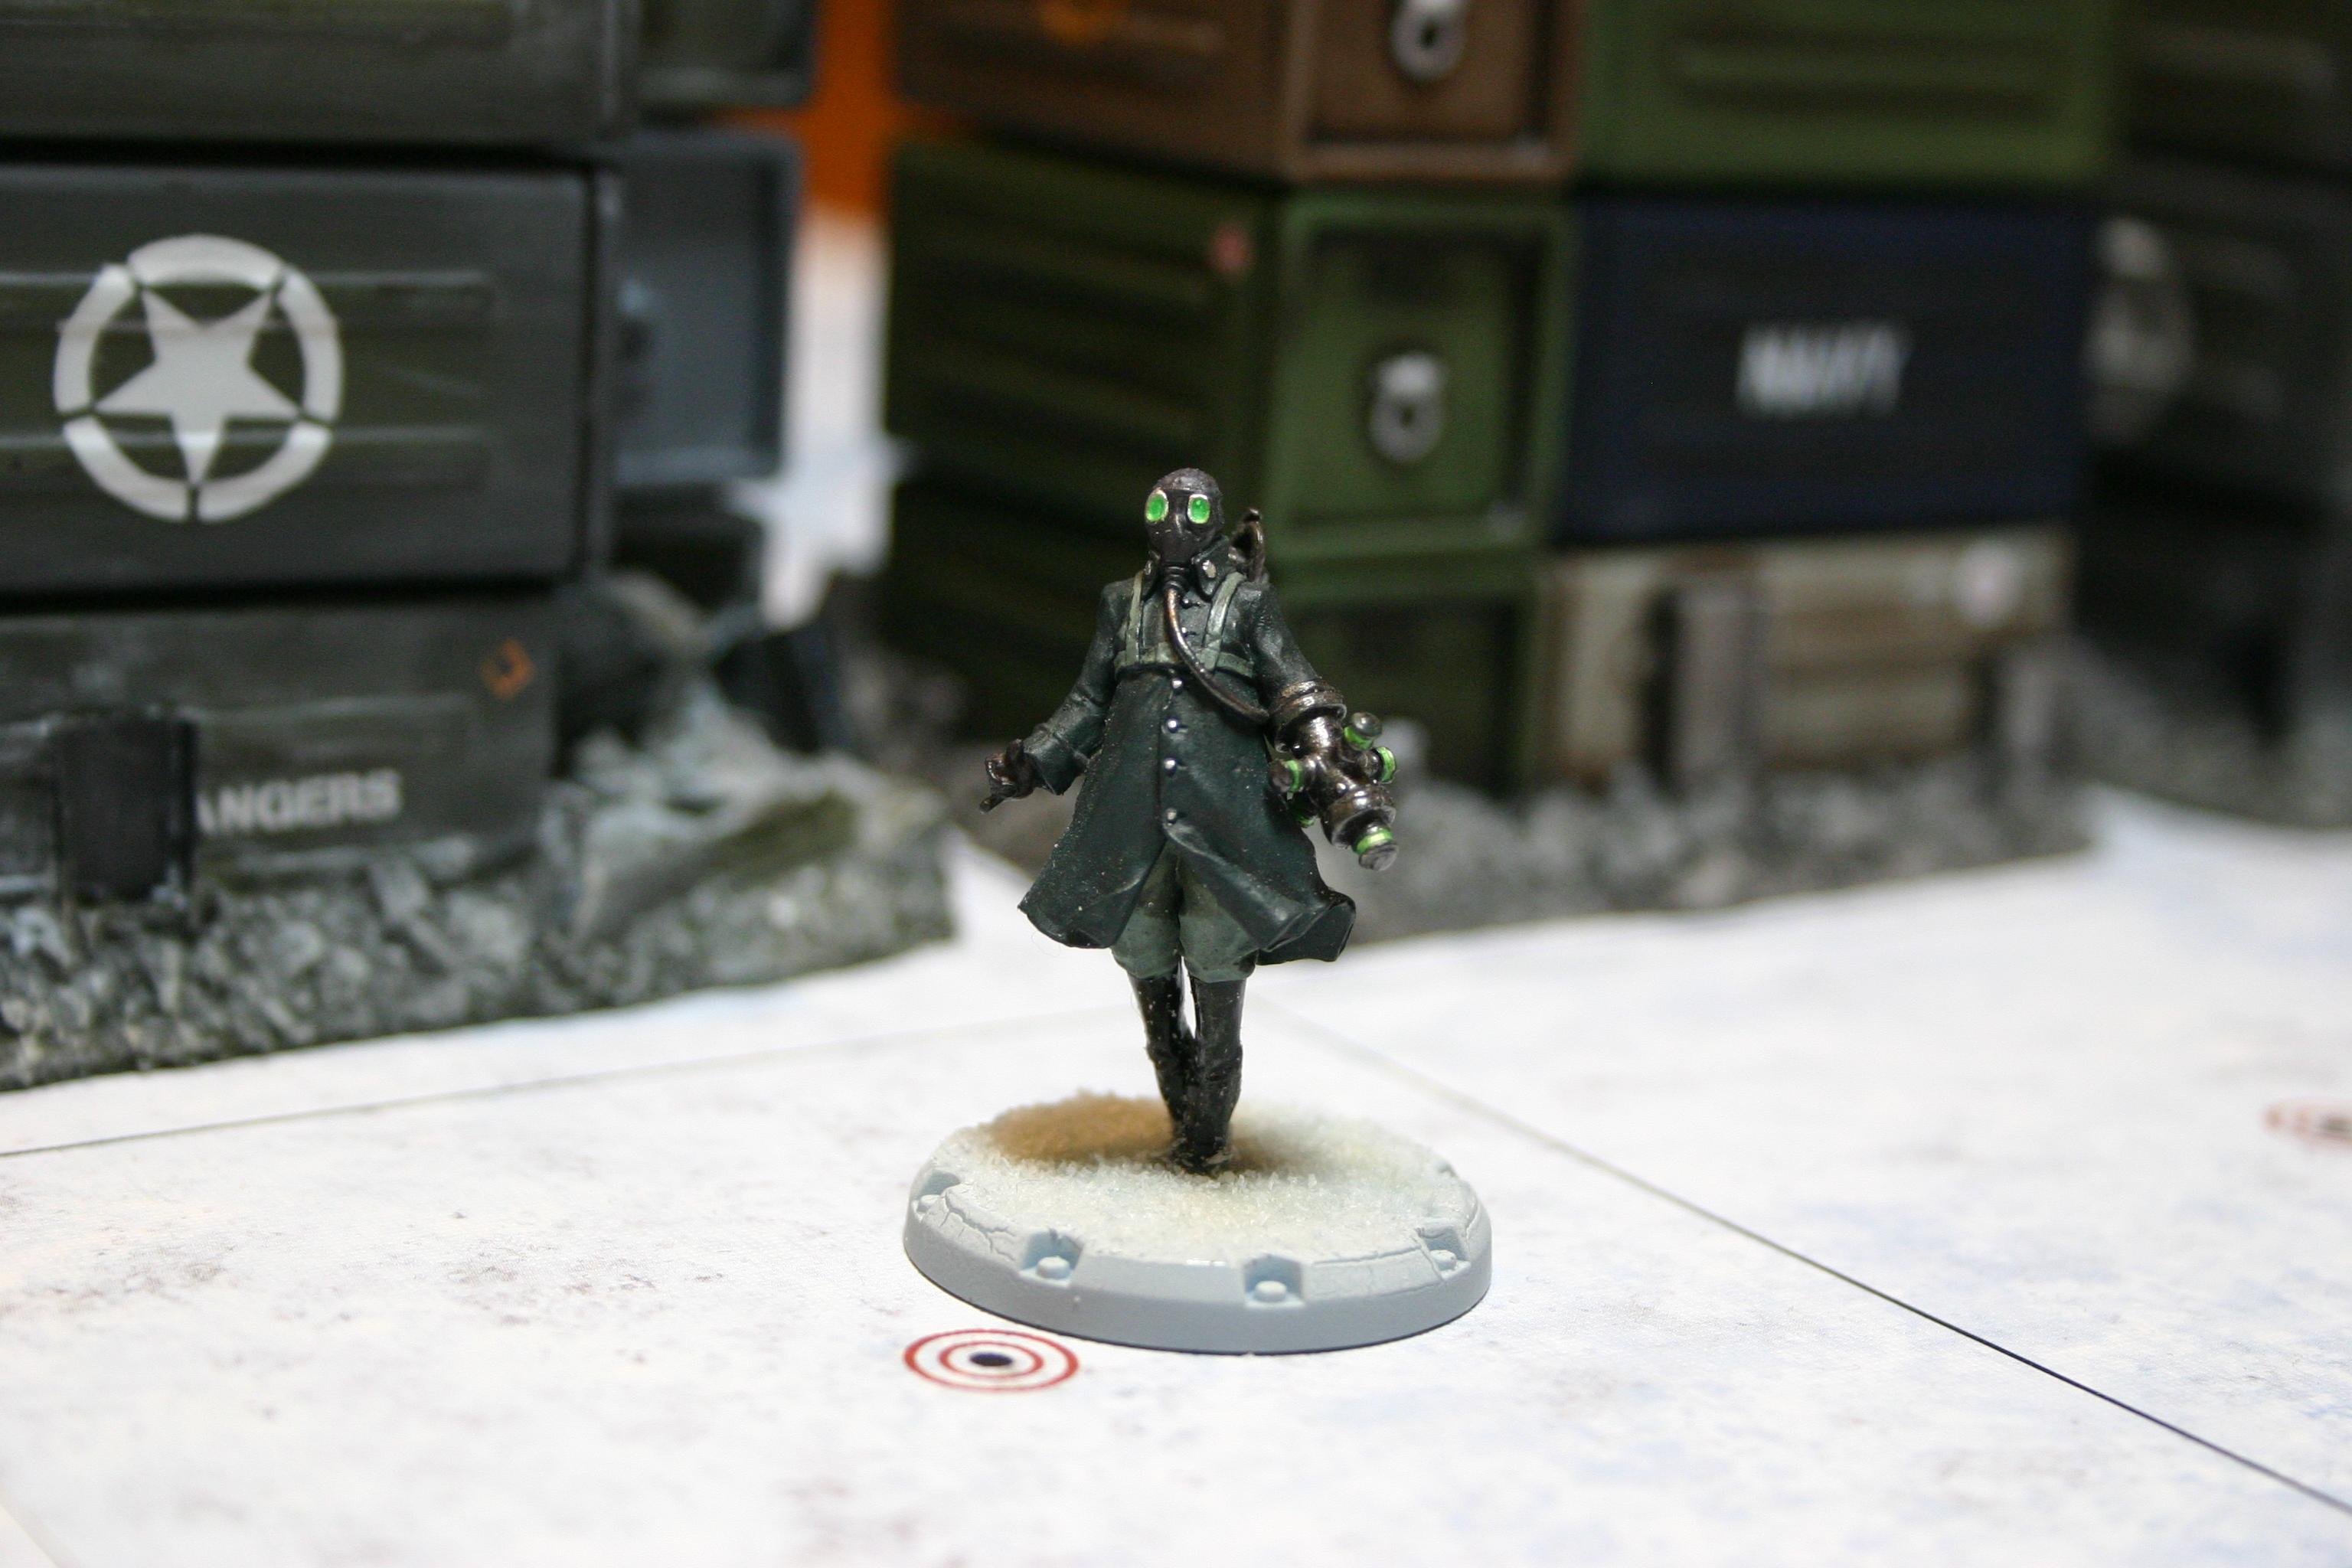 Alternate, Dieselpunk, Dust, Dust Tactics, Nazi, Necromancer, Tactics, Warfare, World War, World War 2